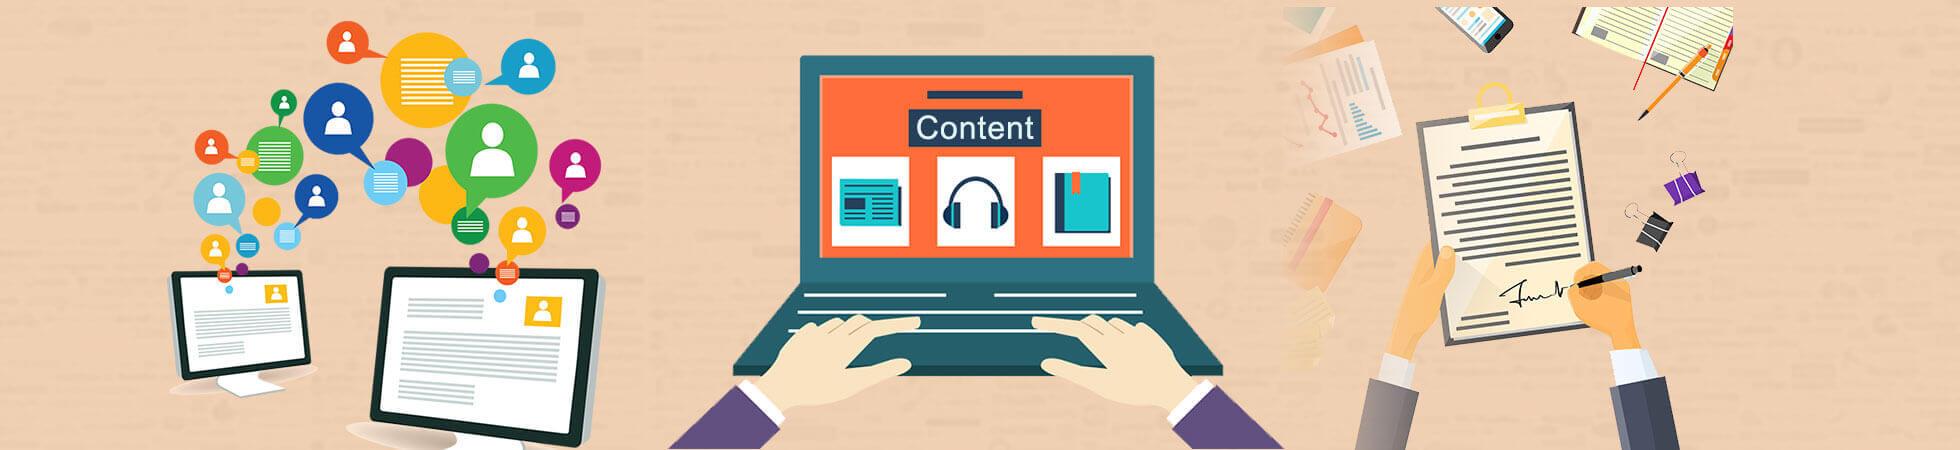 Content Development Services   Website Content Writing Services